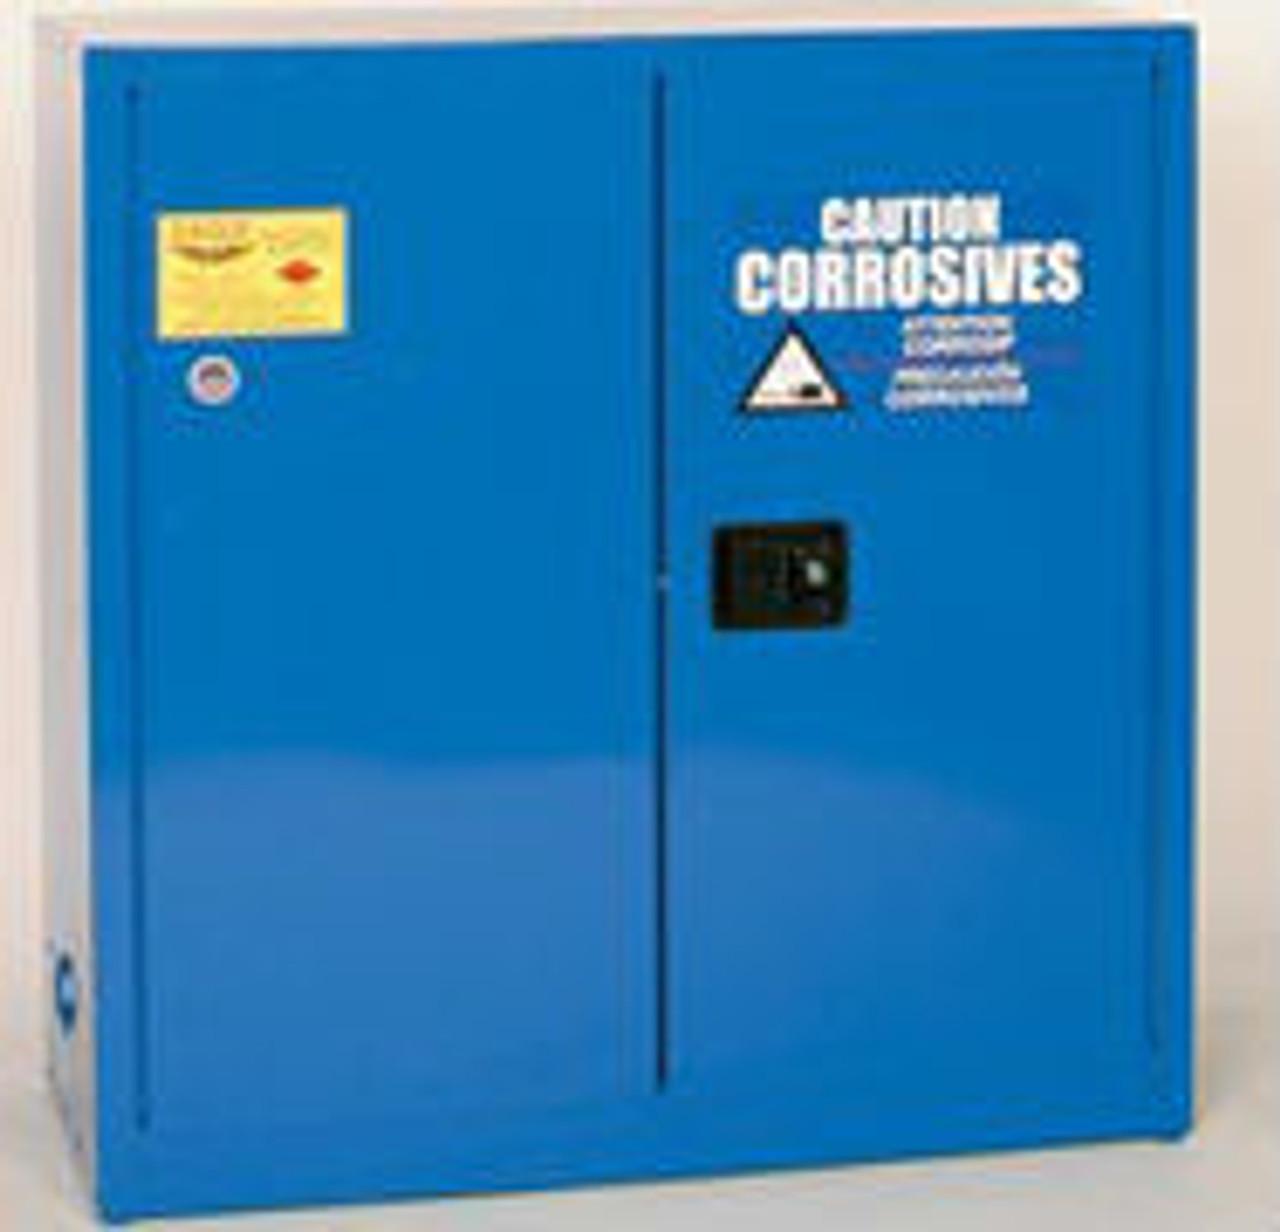 Eagle Acid/Corrosive Safety Cabinets